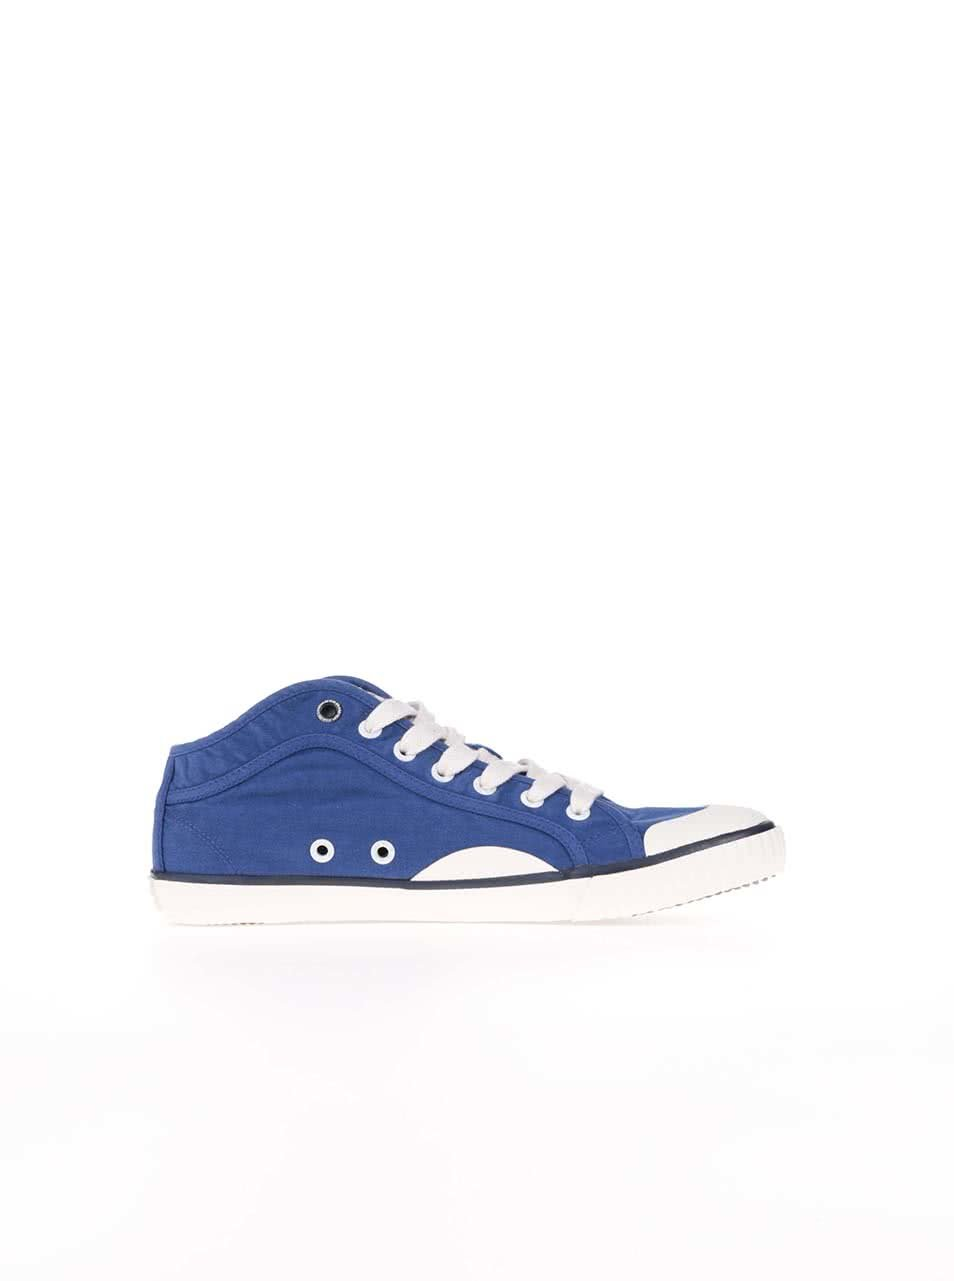 a1cad38d166 Modré pánske tenisky Pepe Jeans Industry ...